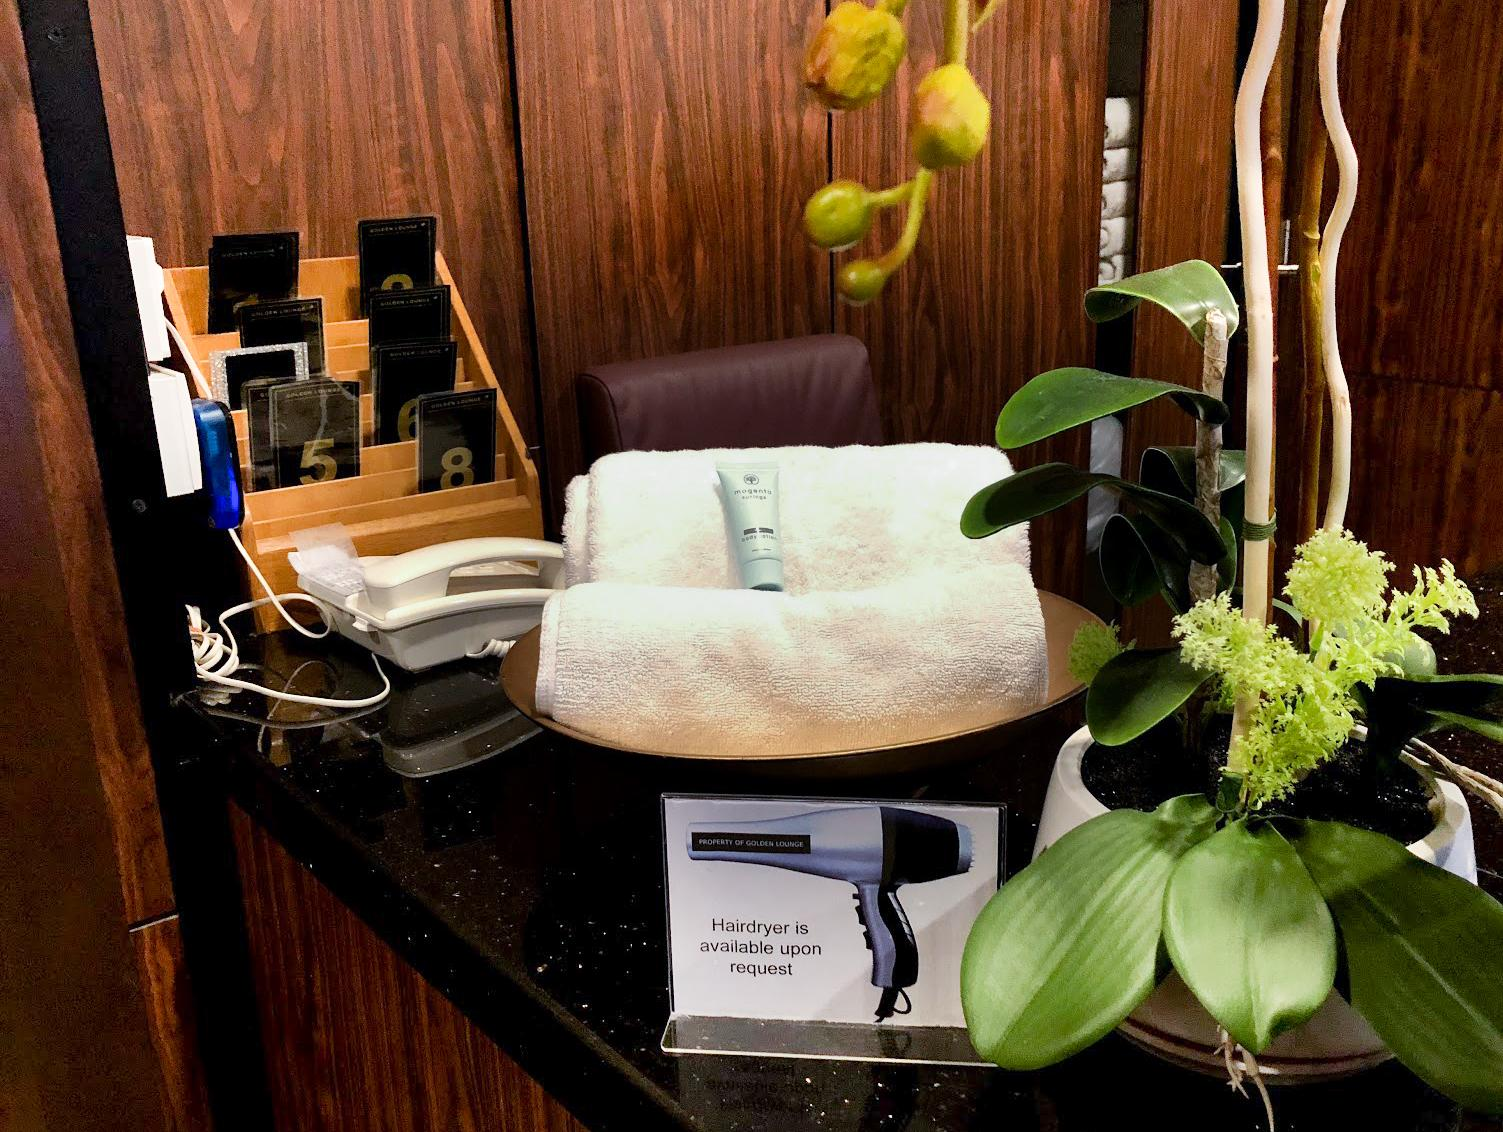 Malaysia Airlines Satellite Golden Lounge Kuala Lumpur bathroom amenities